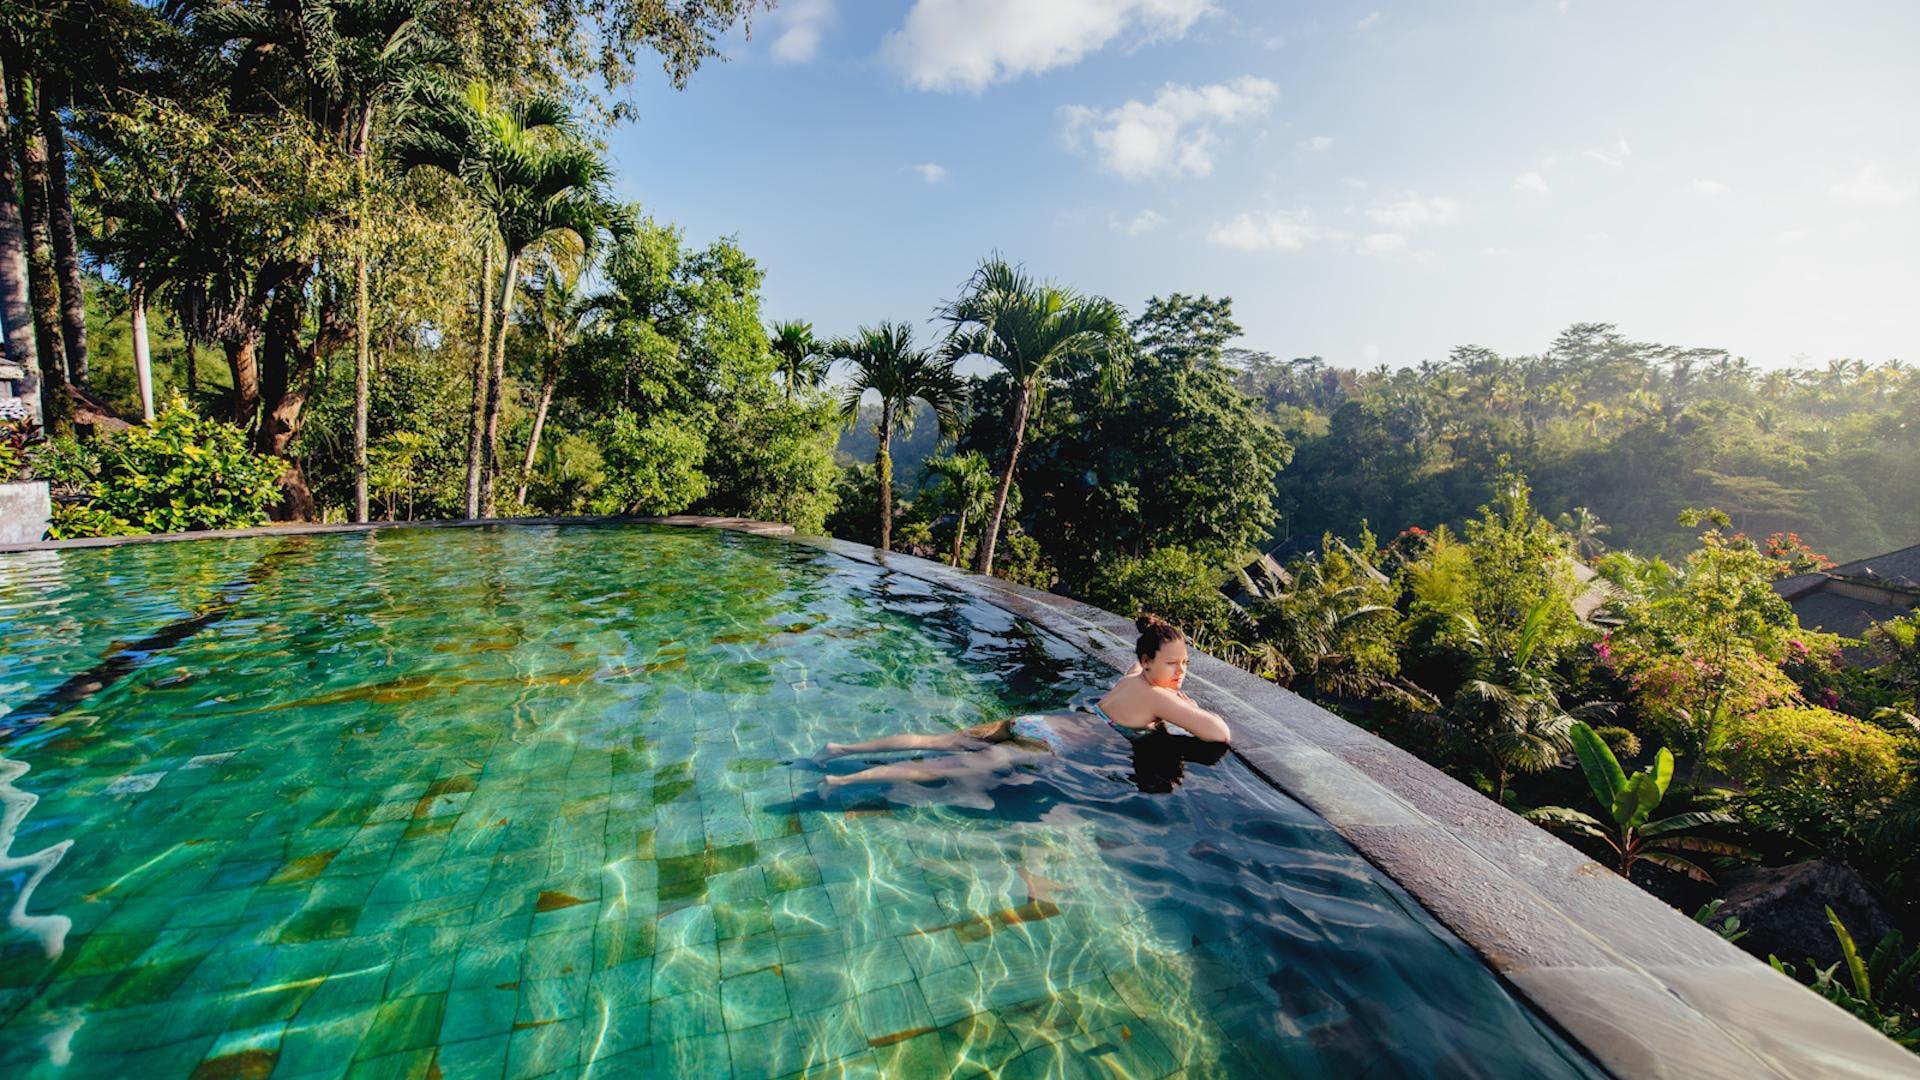 How to find your zen in Bali